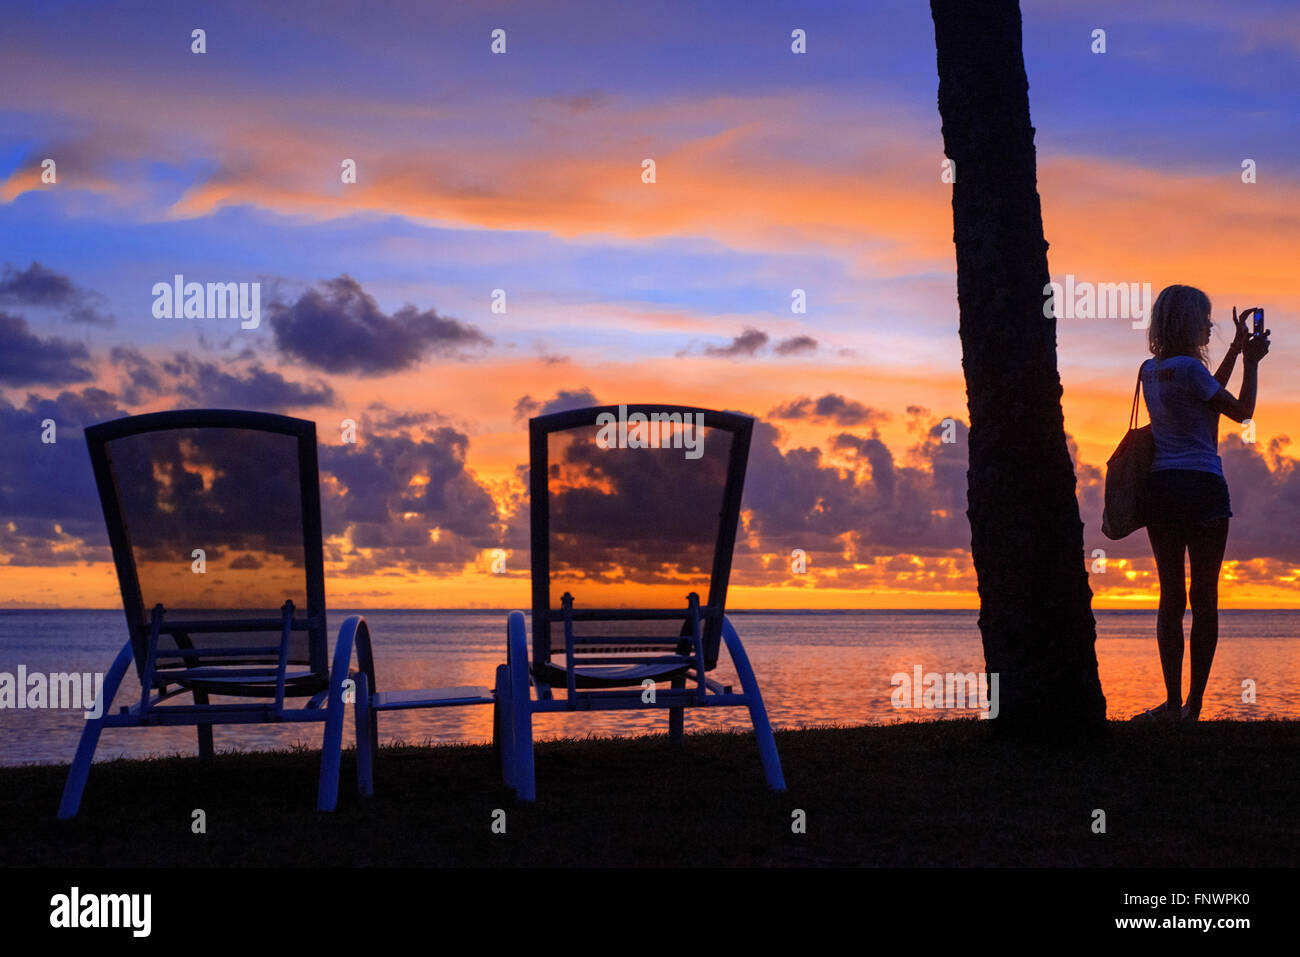 Sonnenuntergang am Meridien Hotel auf der Insel Tahiti, Französisch-Polynesien, Tahiti Nui, Gesellschaftsinseln, Stockbild